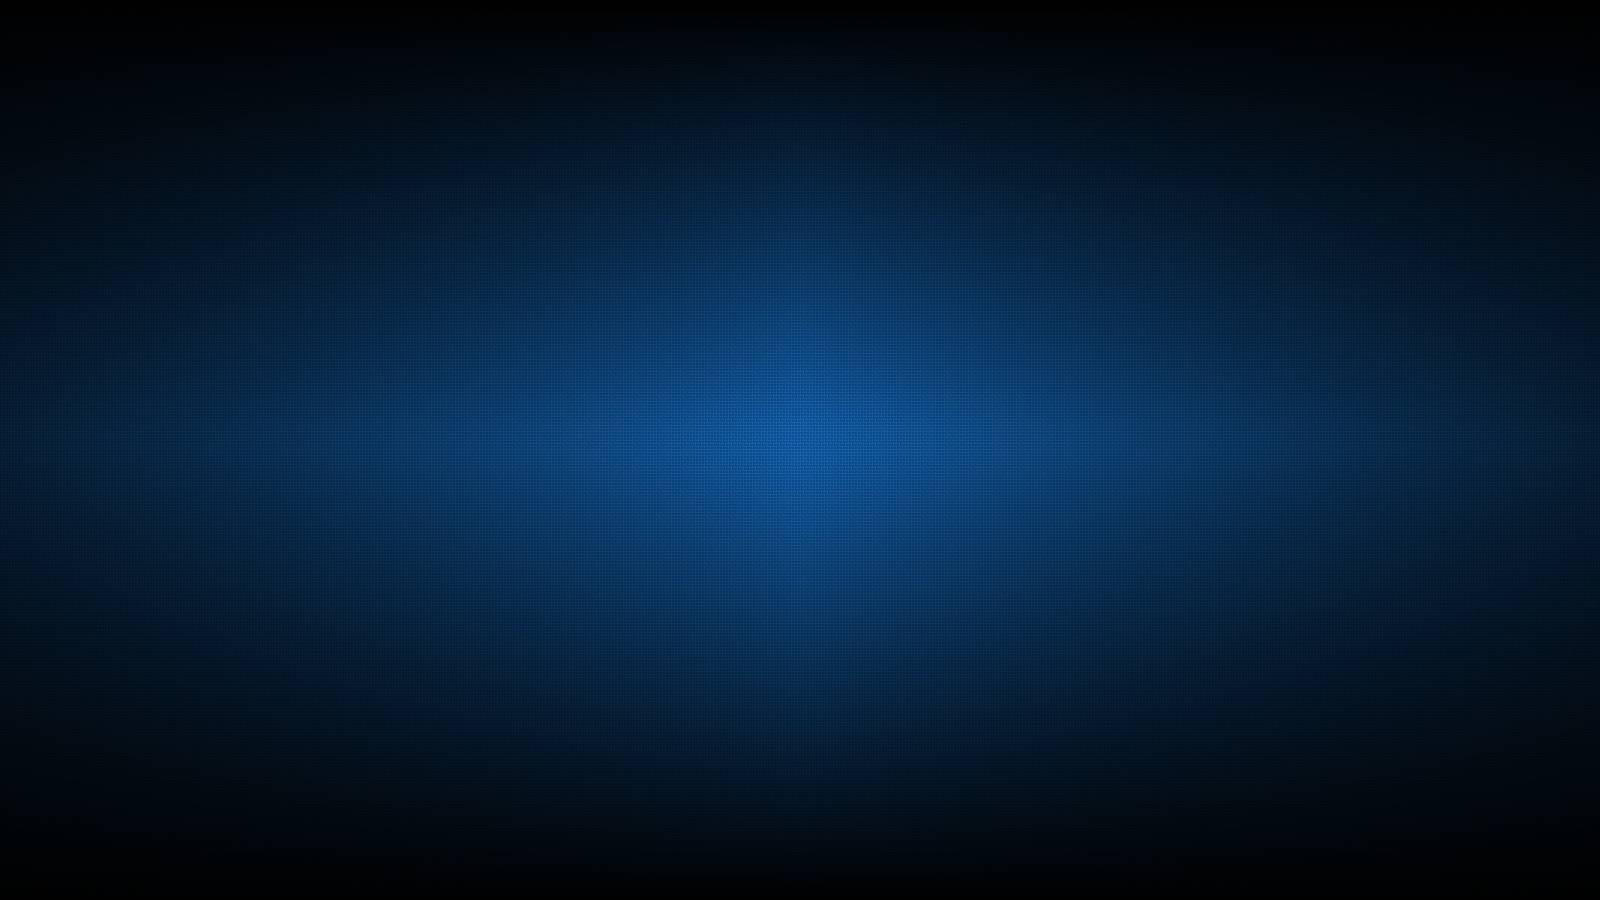 Dark Blue Wallpaper, 34 Dark Blue 2016 Wallpaper's Archive, Nice